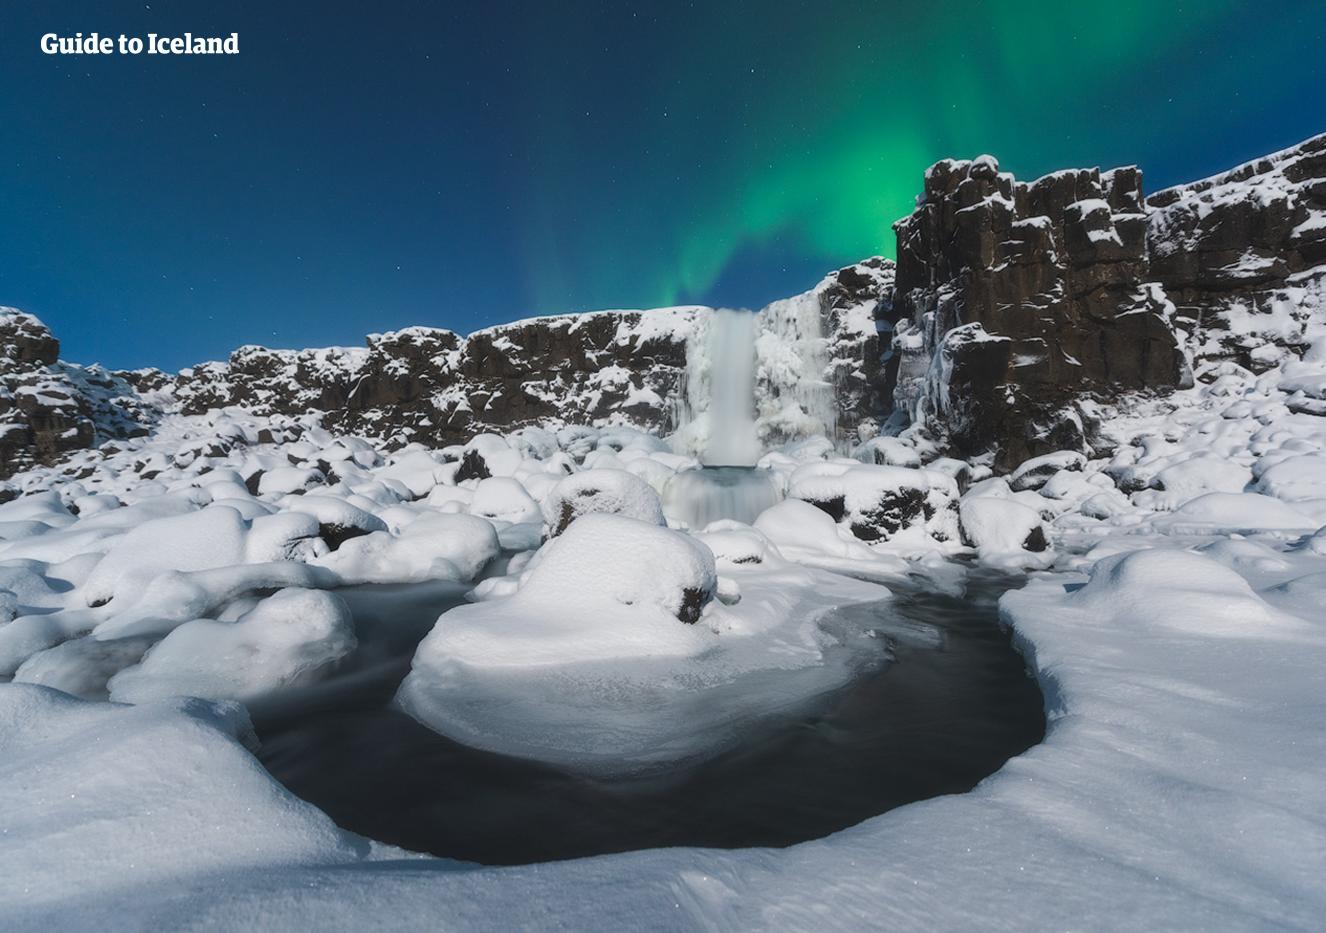 Die Polarlichter tanzen am Himmel über dem Wasserfall Öxarárfoss im Þingvellir-Nationalpark.